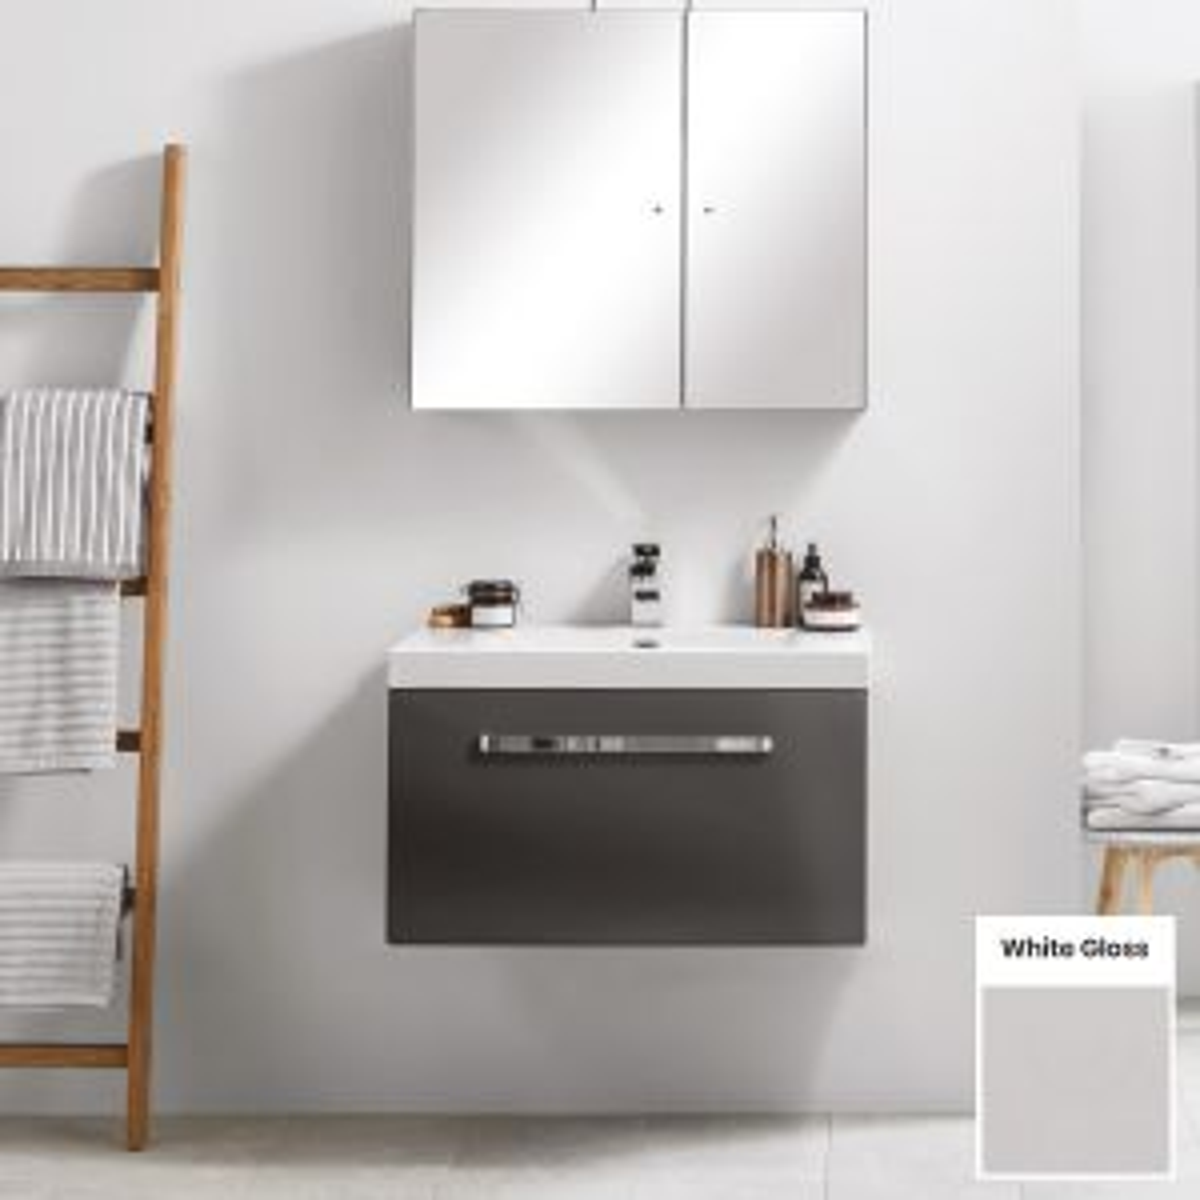 Elation Eko White Gloss Vanity Unit with Slab Drawer 750mm